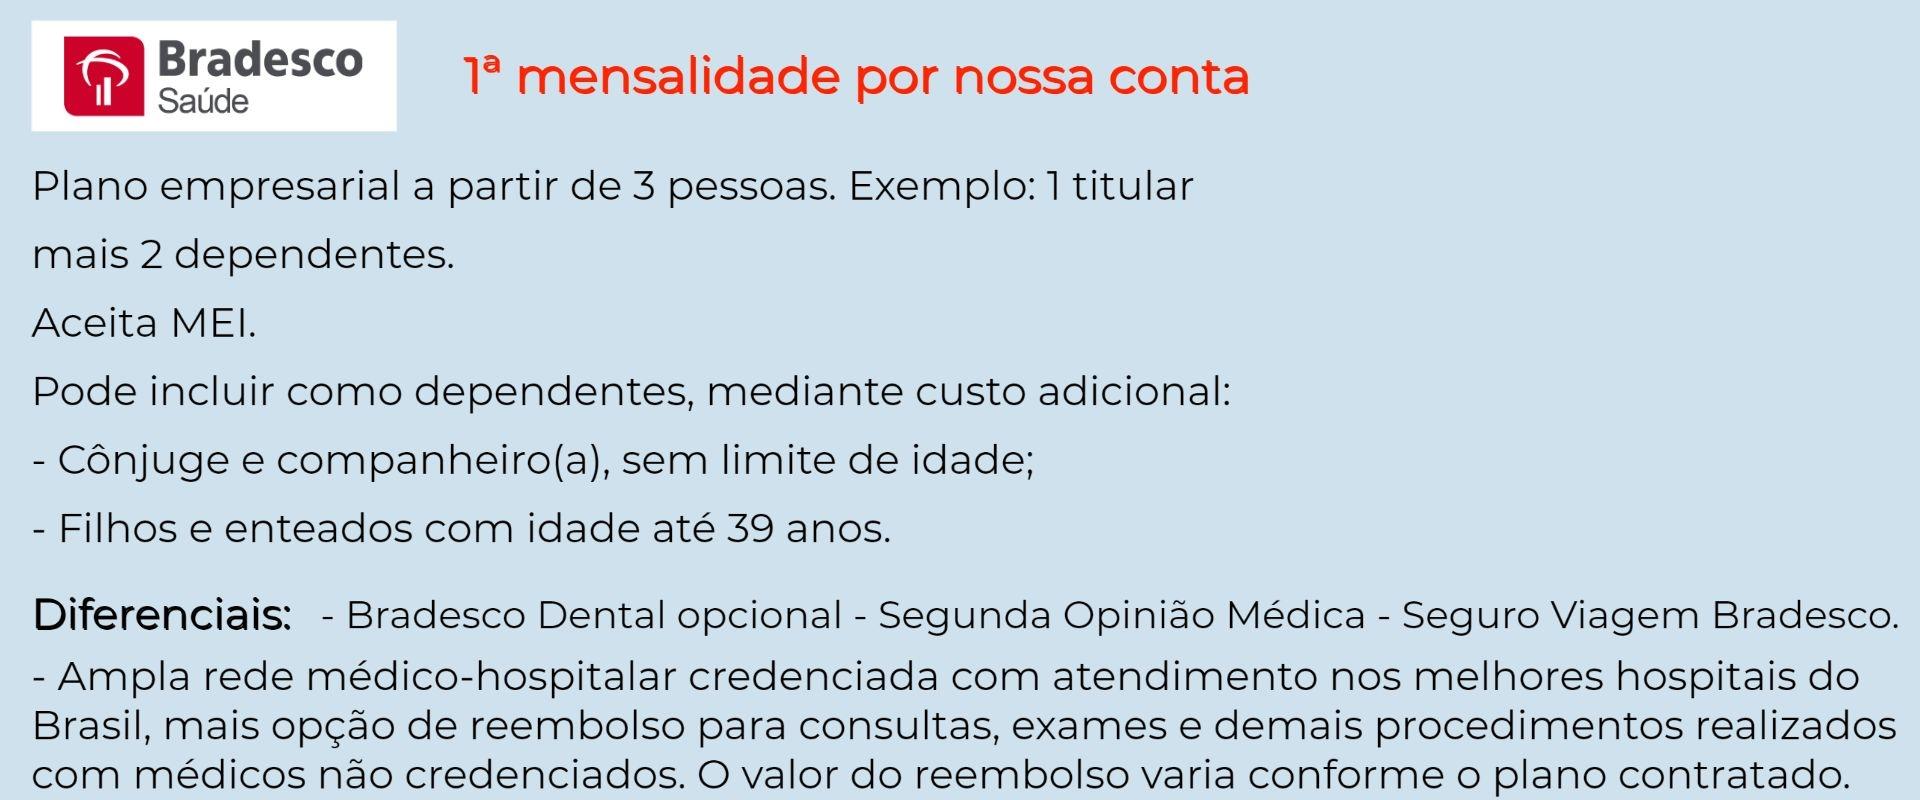 Bradesco Saúde Empresarial – Ipiaú